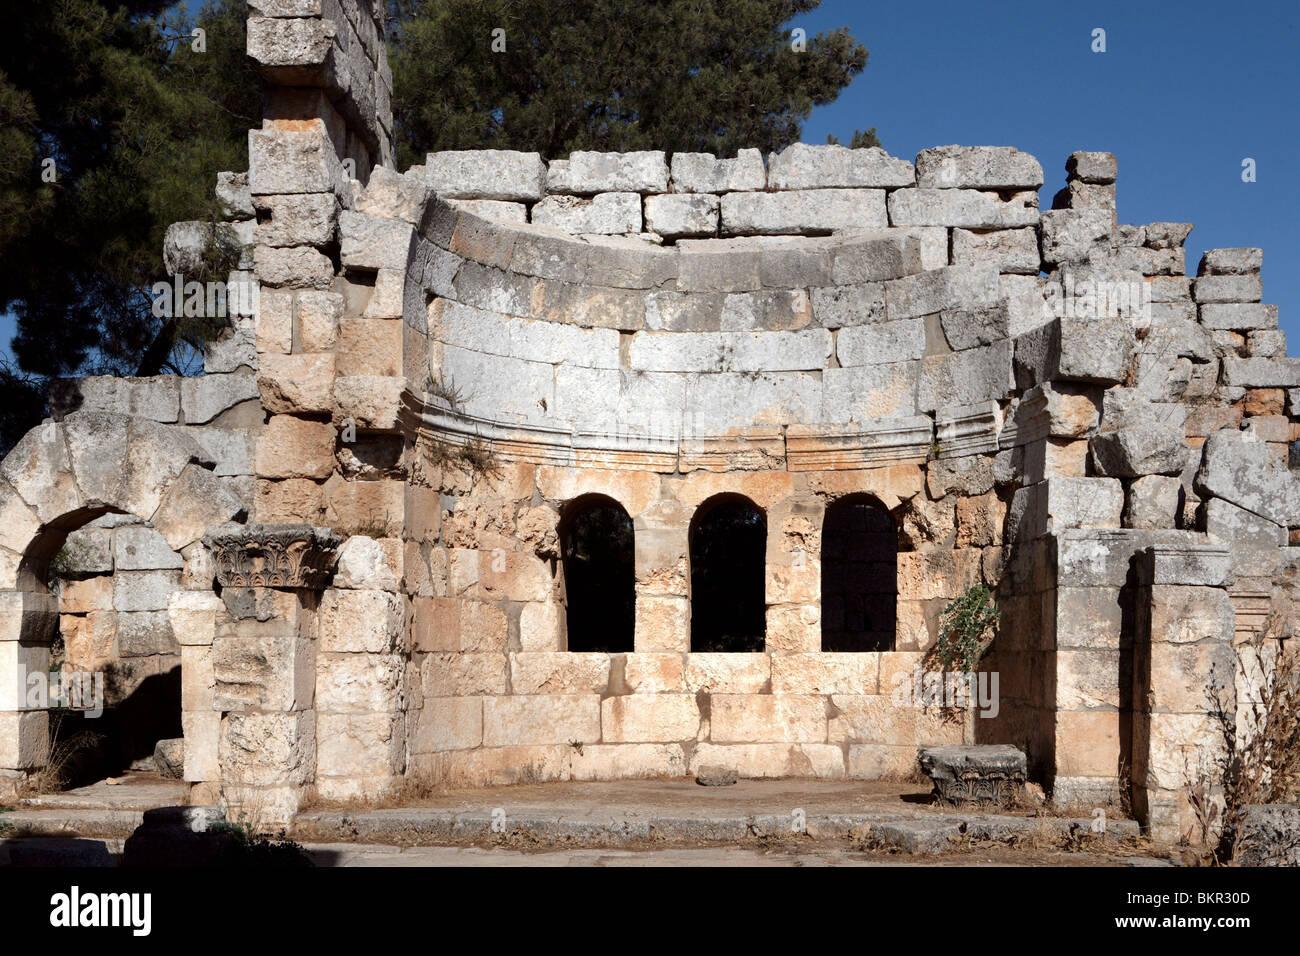 Ruined baptistery, St Simeon Stylite basilica, 473, Deir Samaan, Syria. - Stock Image